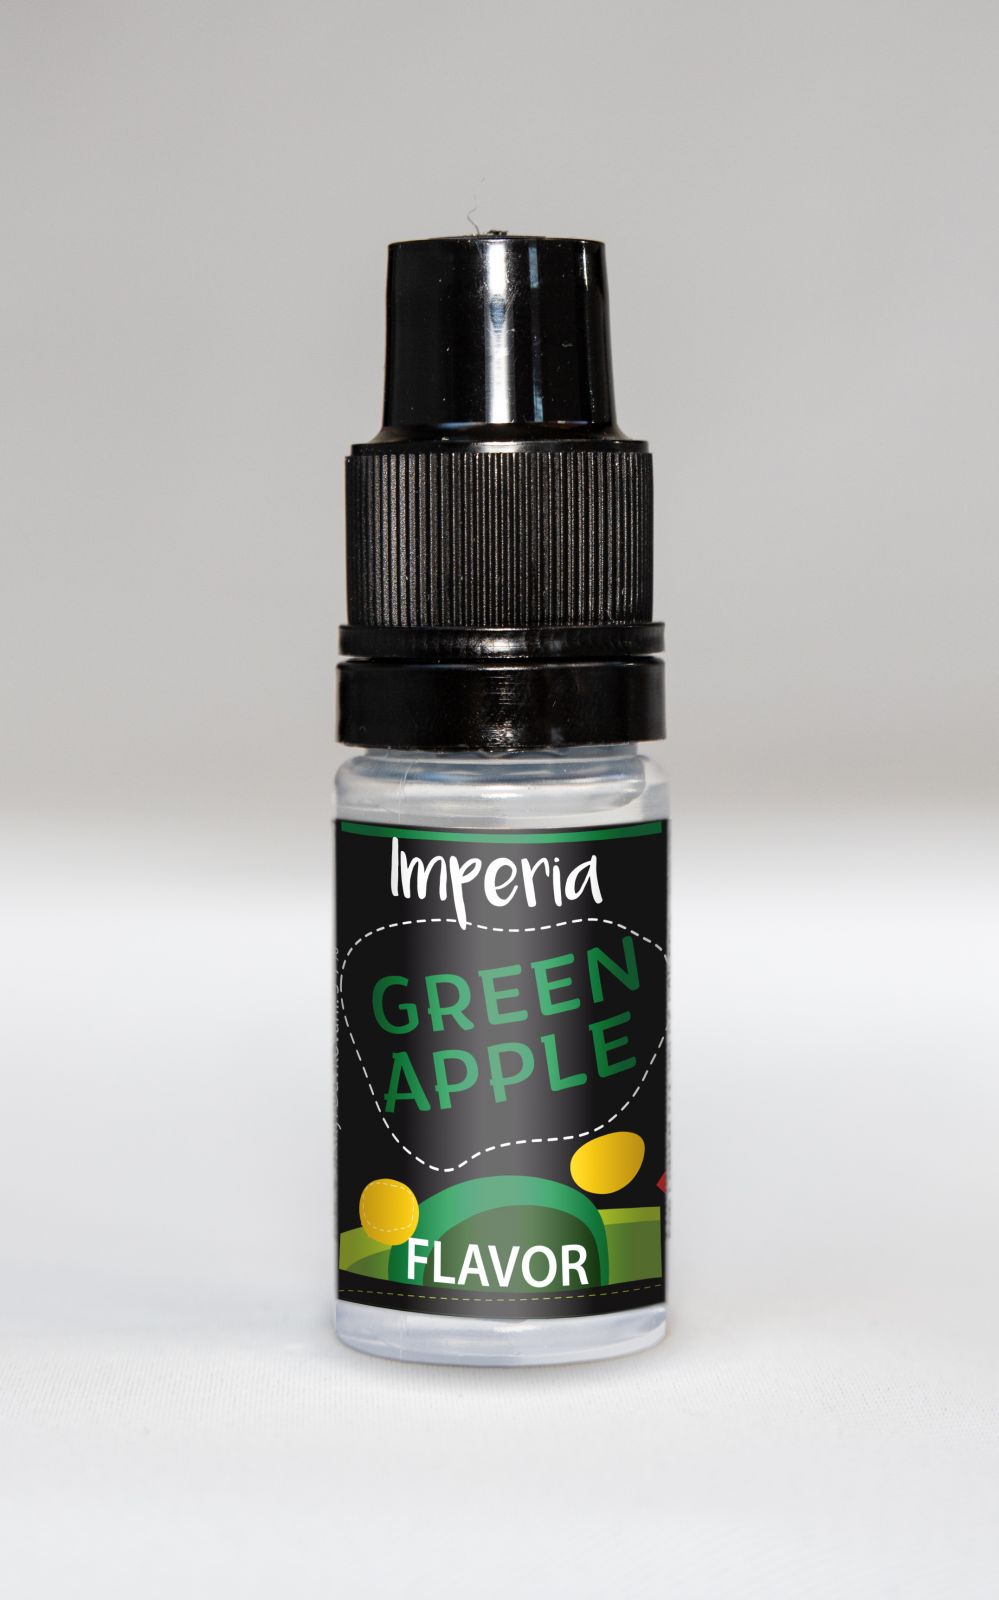 GREEN APPLE / Zelené jablko - Aroma Imperia Black Label Boudoir Samadhi s.r.o.